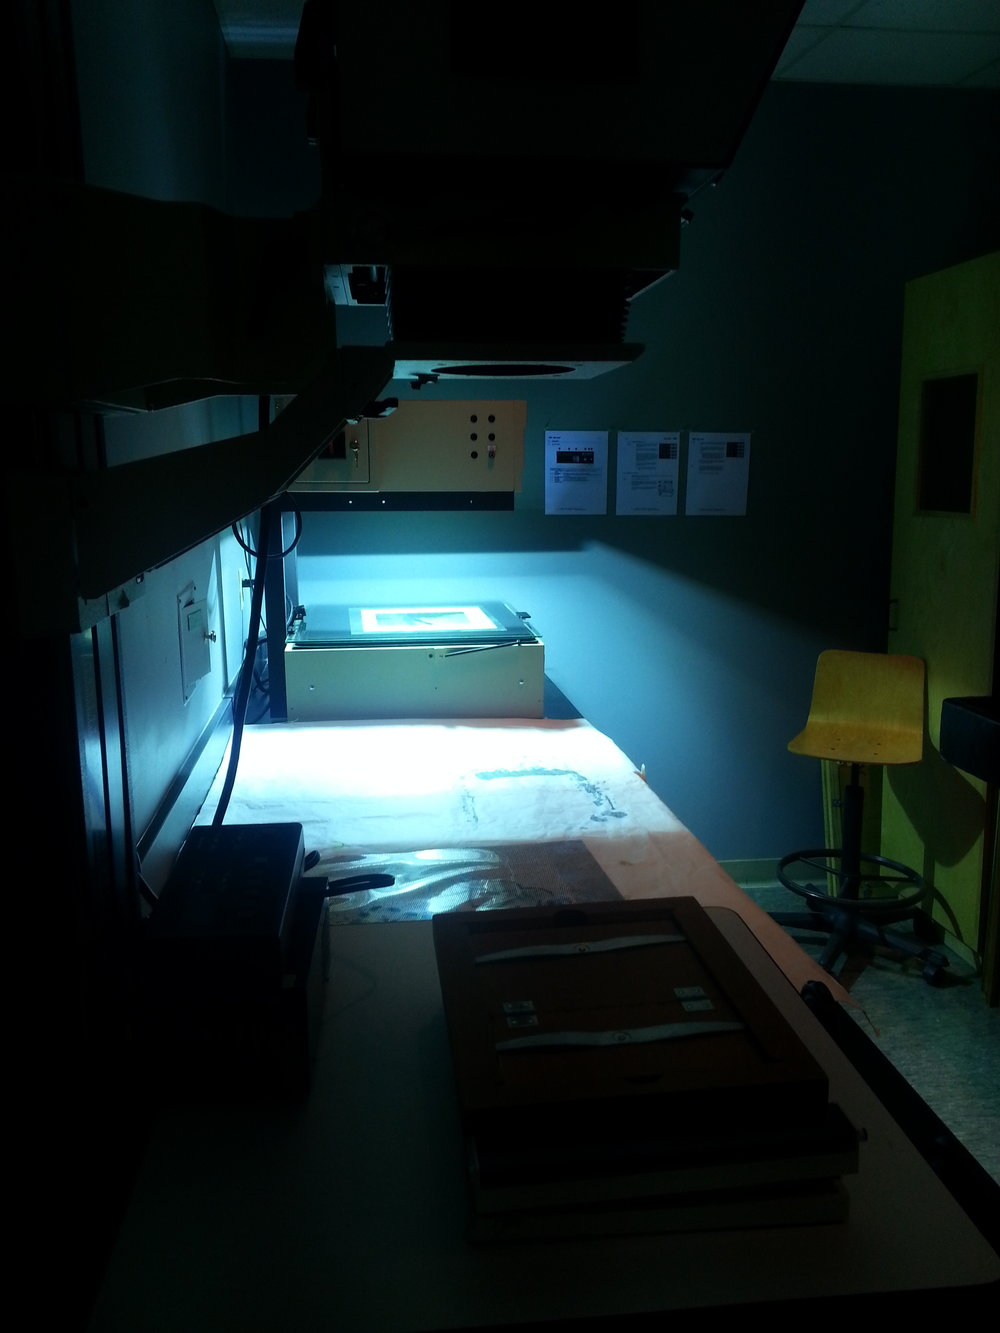 Exposing my cyanotype in the UV processor